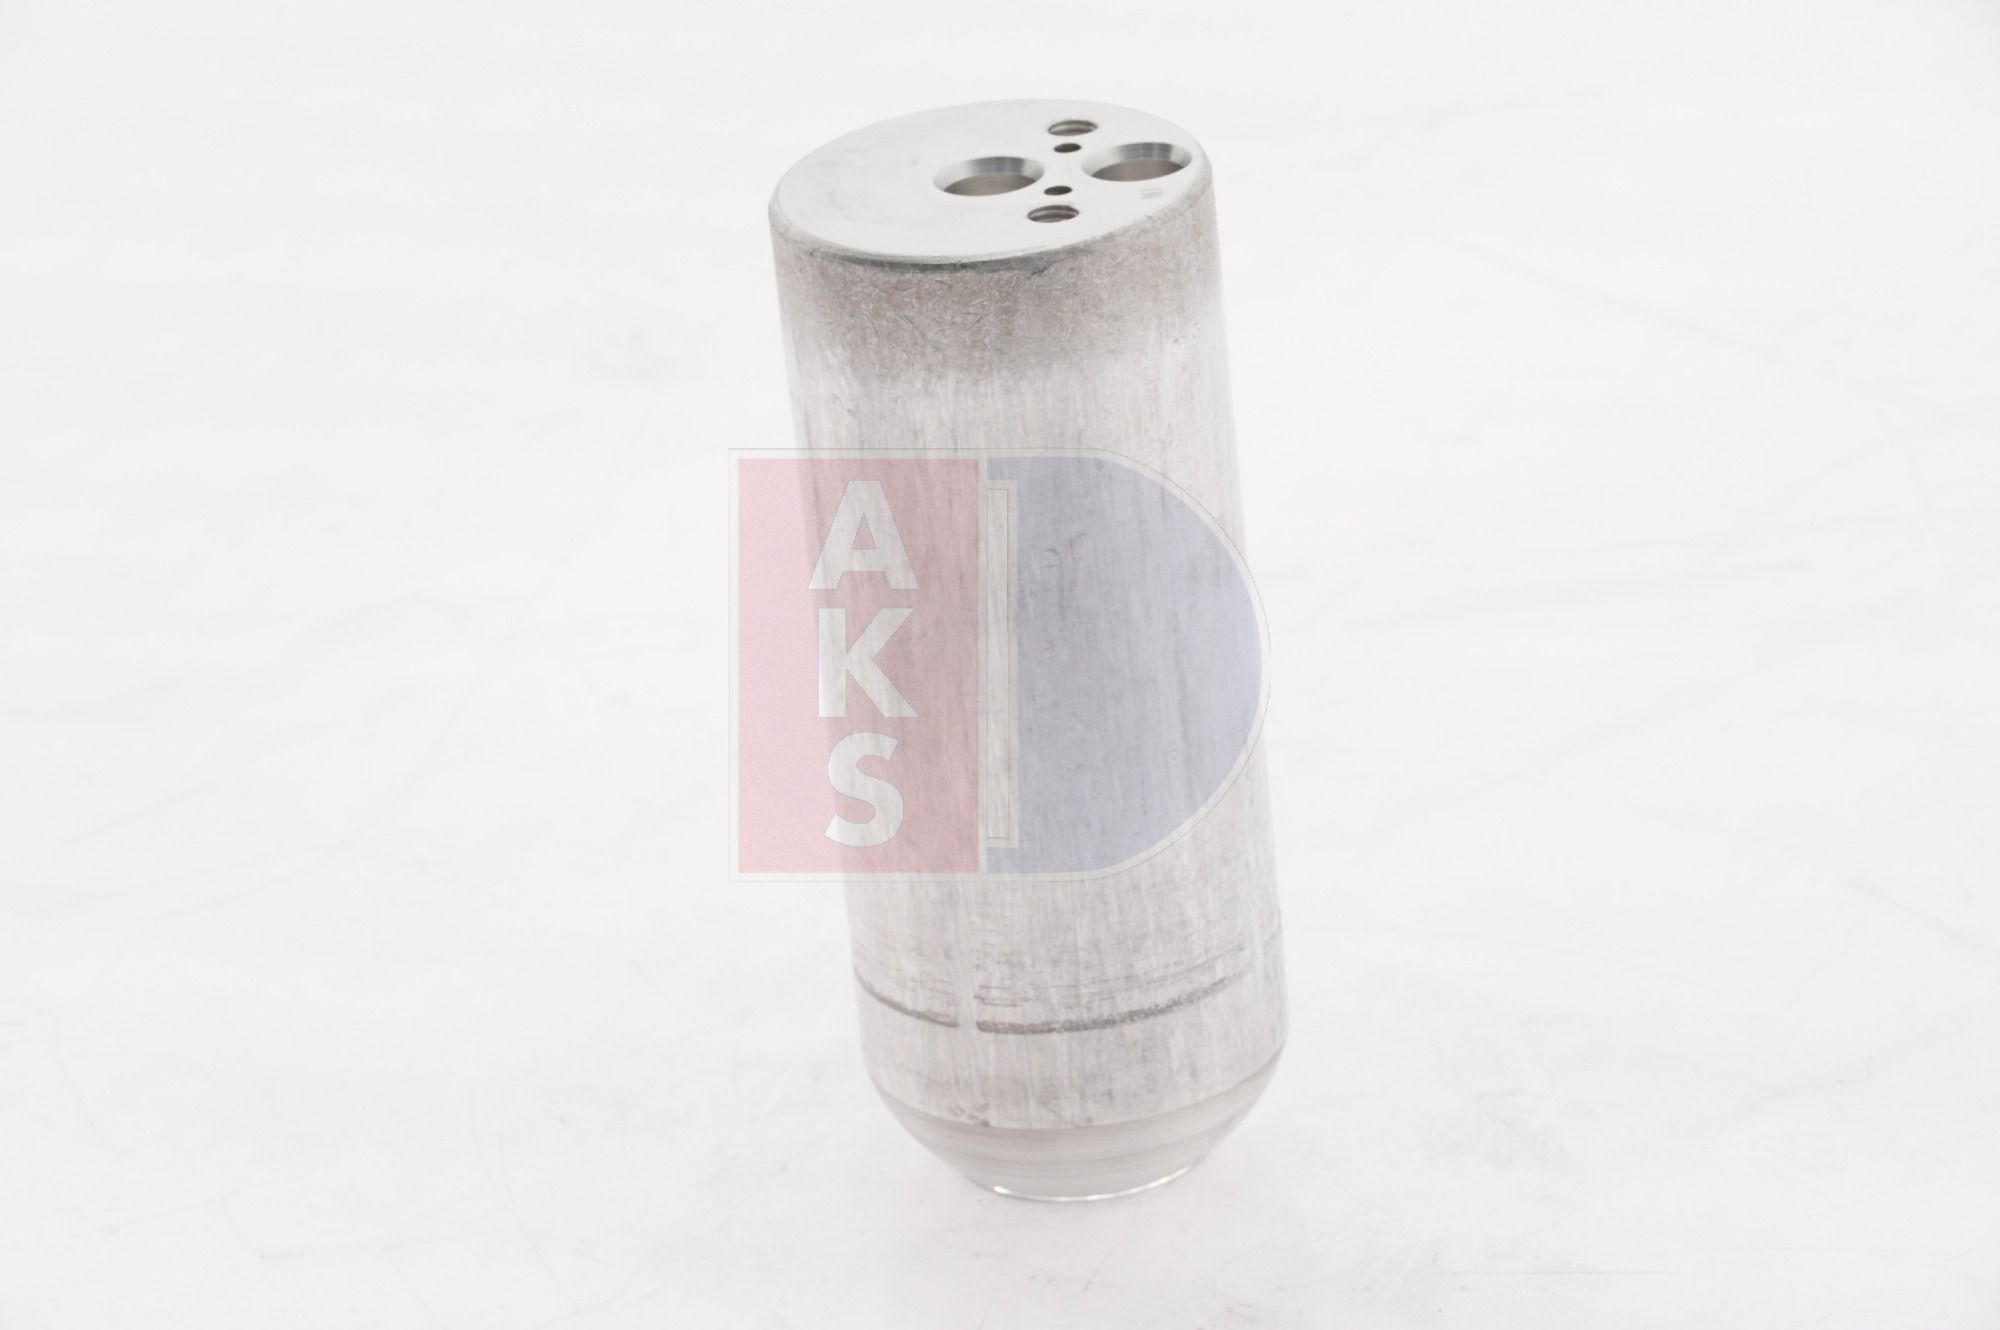 Image of AKS DASIS Essiccatore, Climatizzatore 4044455339151